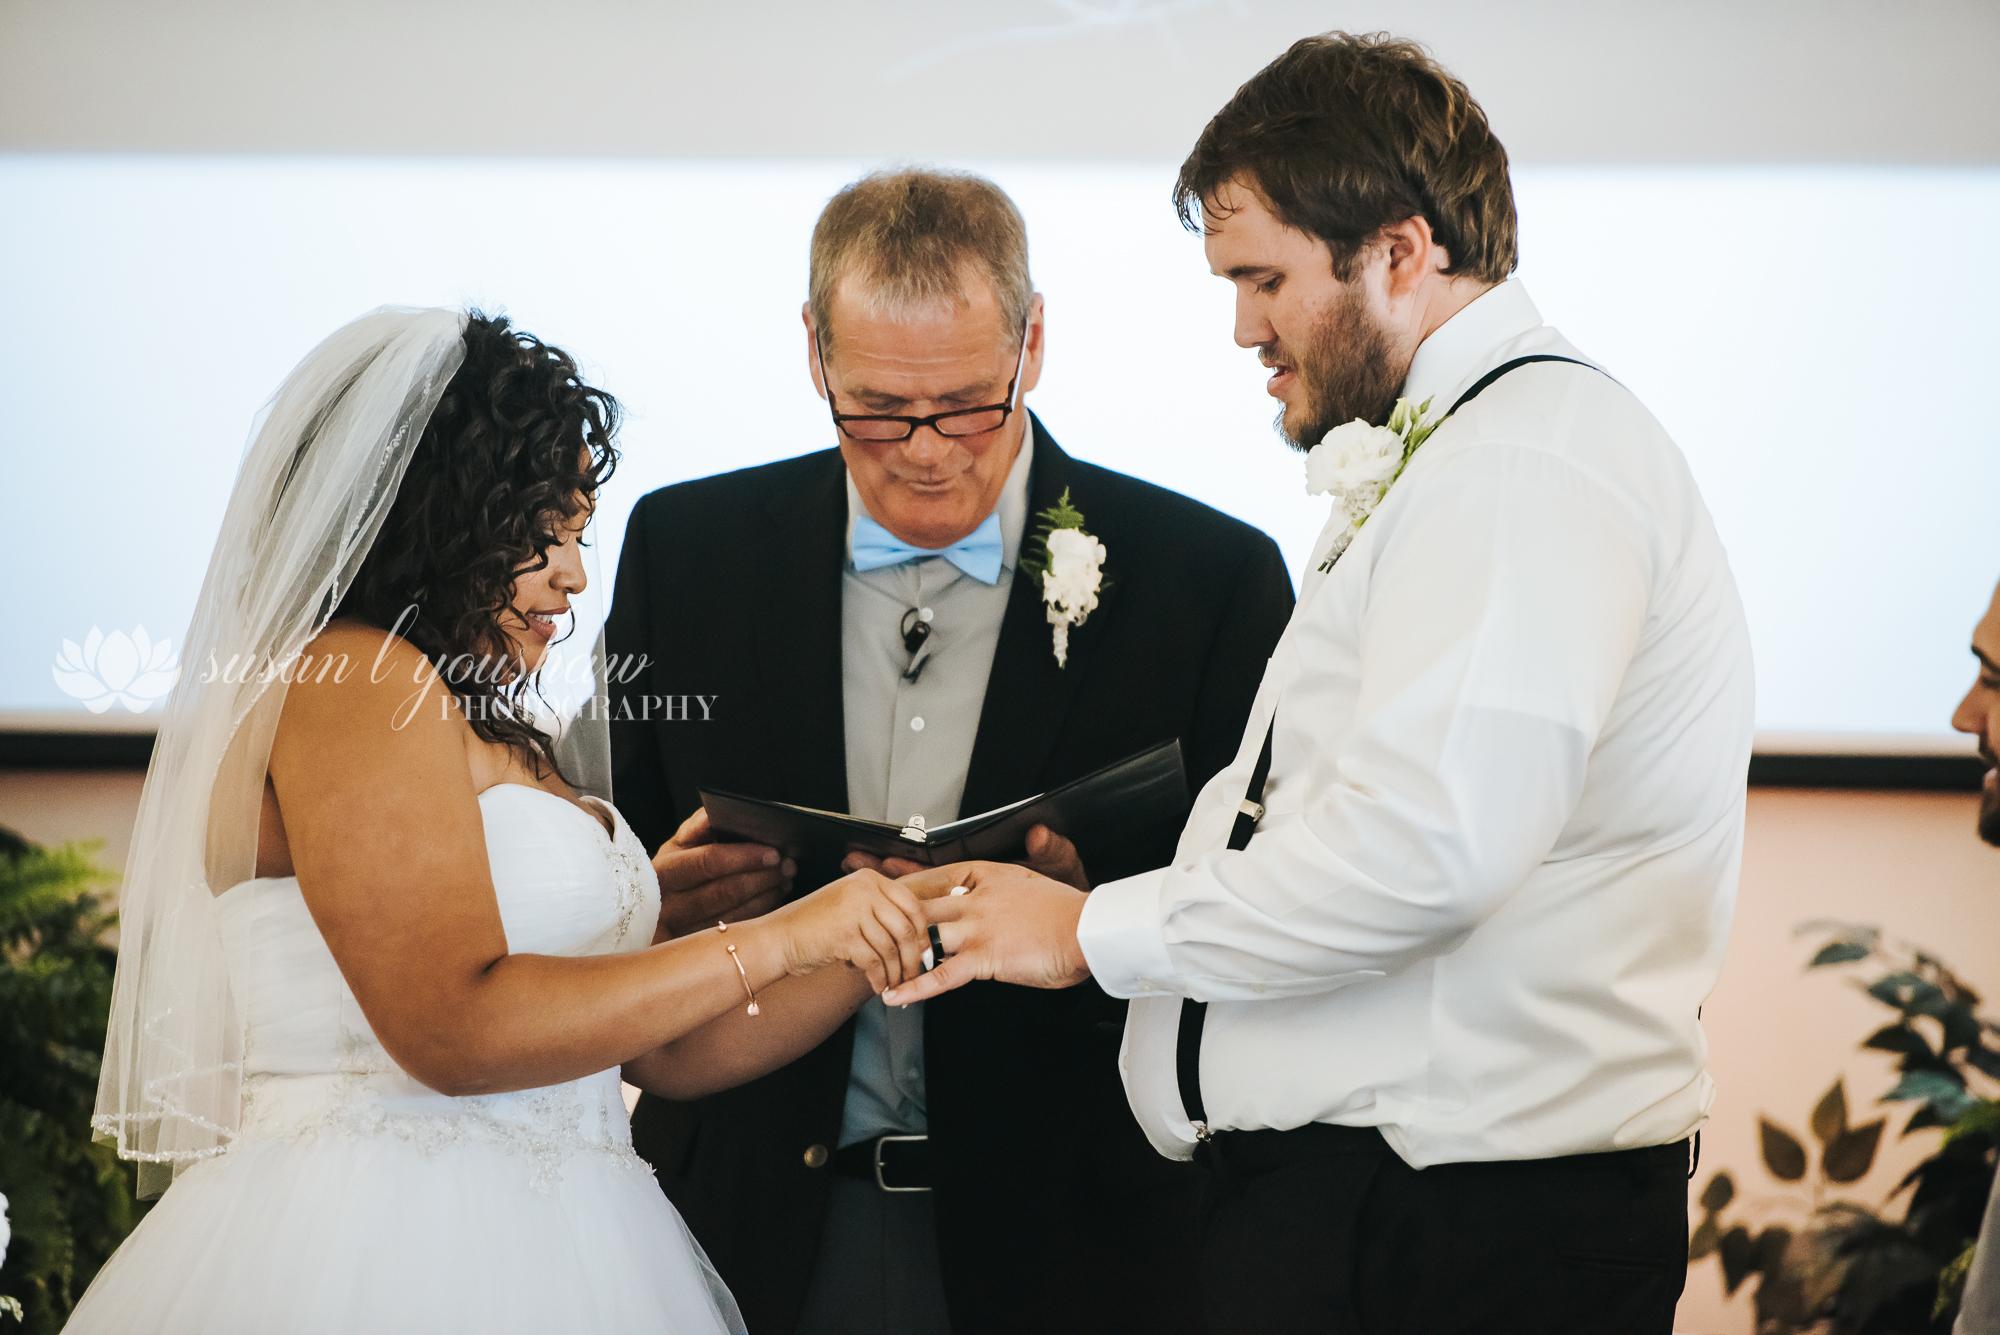 Katelyn and Wes Wedding Photos 07-13-2019 SLY Photography-75.jpg